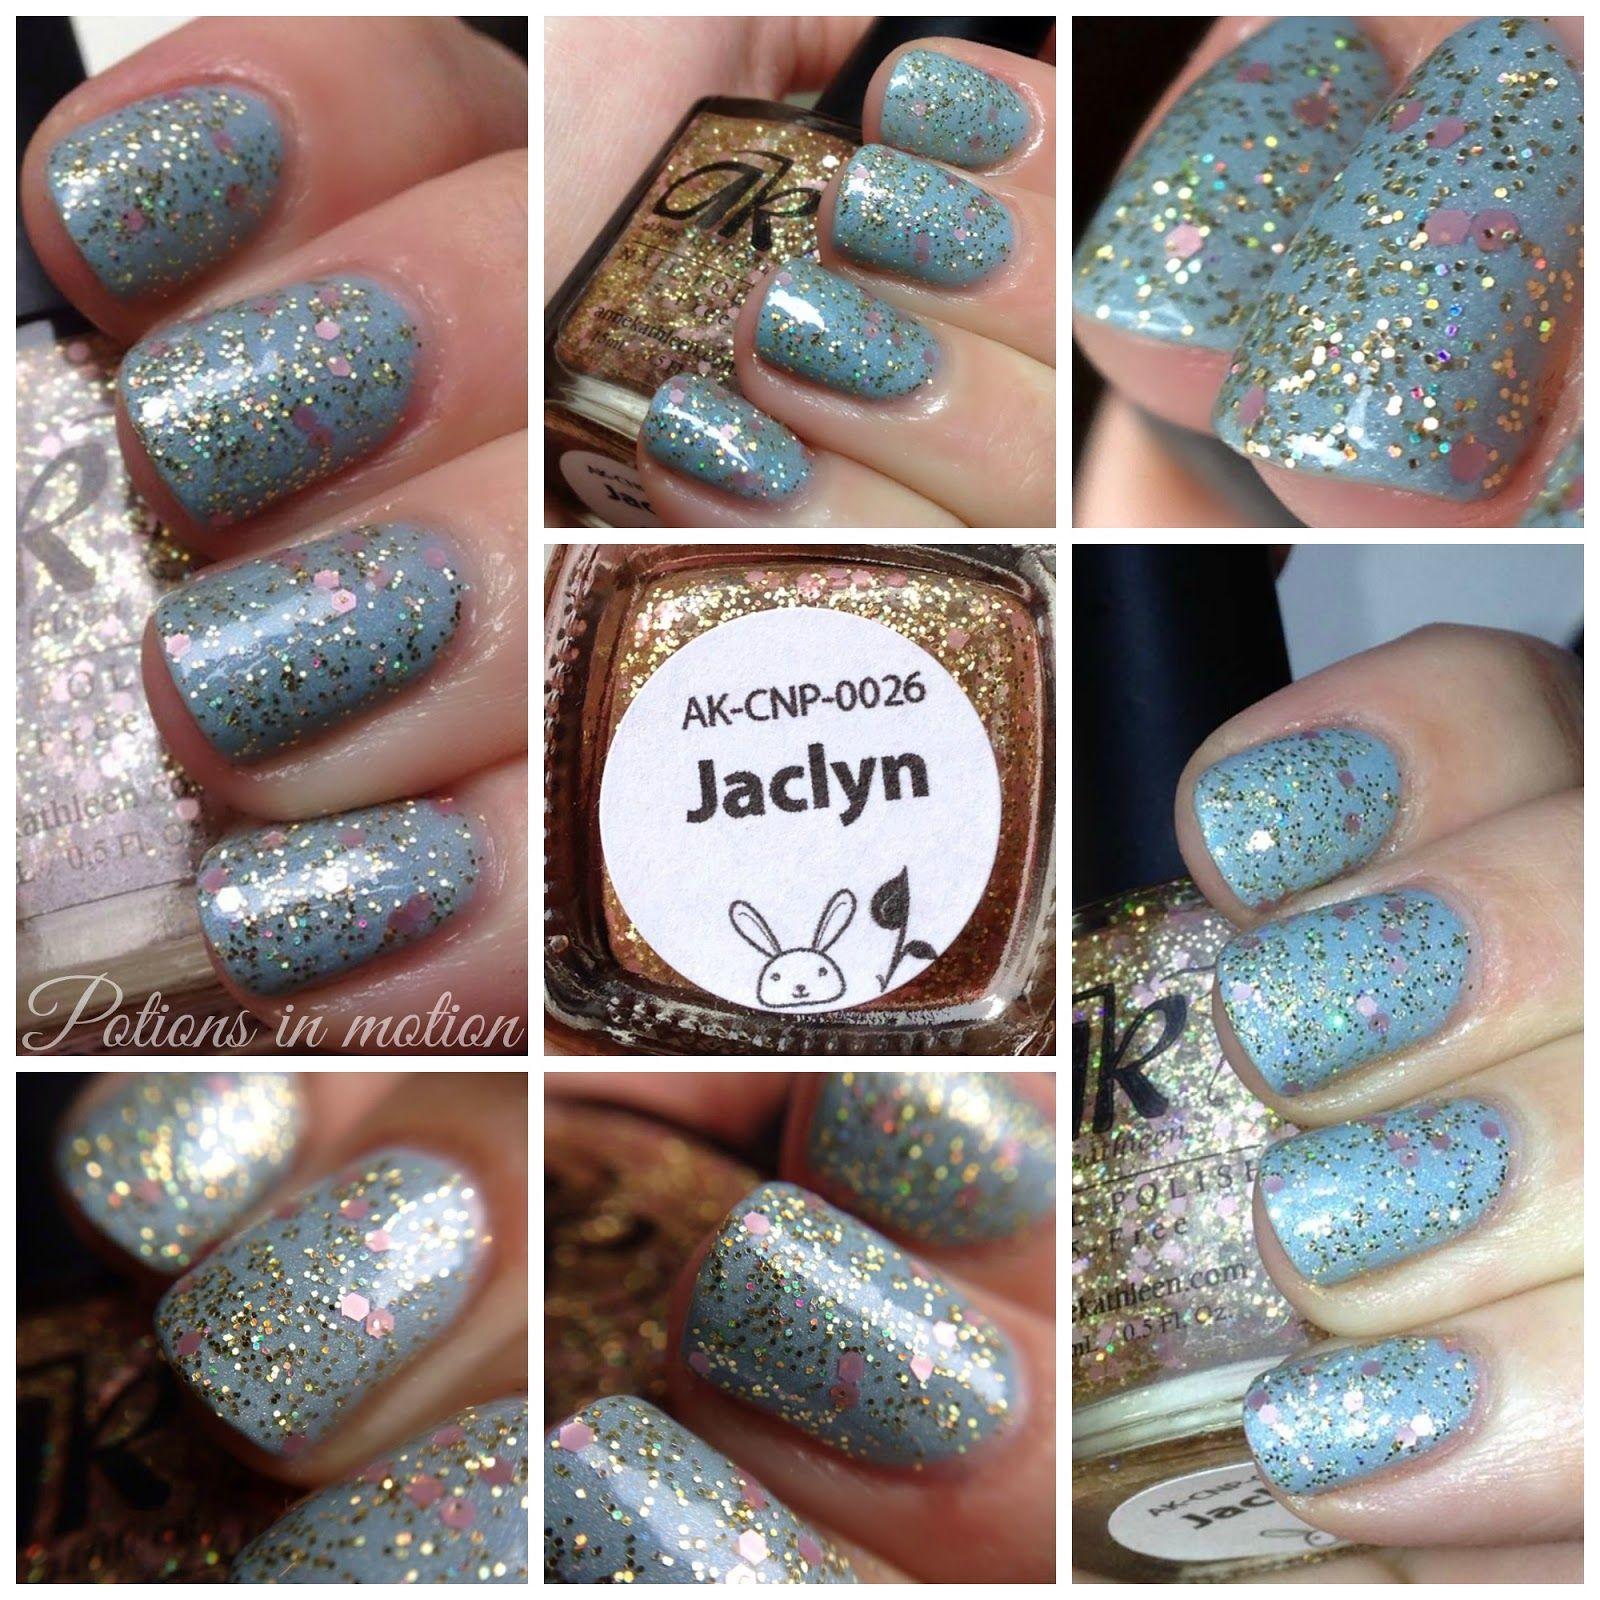 Anne Kathleen Nail Polish - Jaclyn | Nails | Pinterest | Swatch